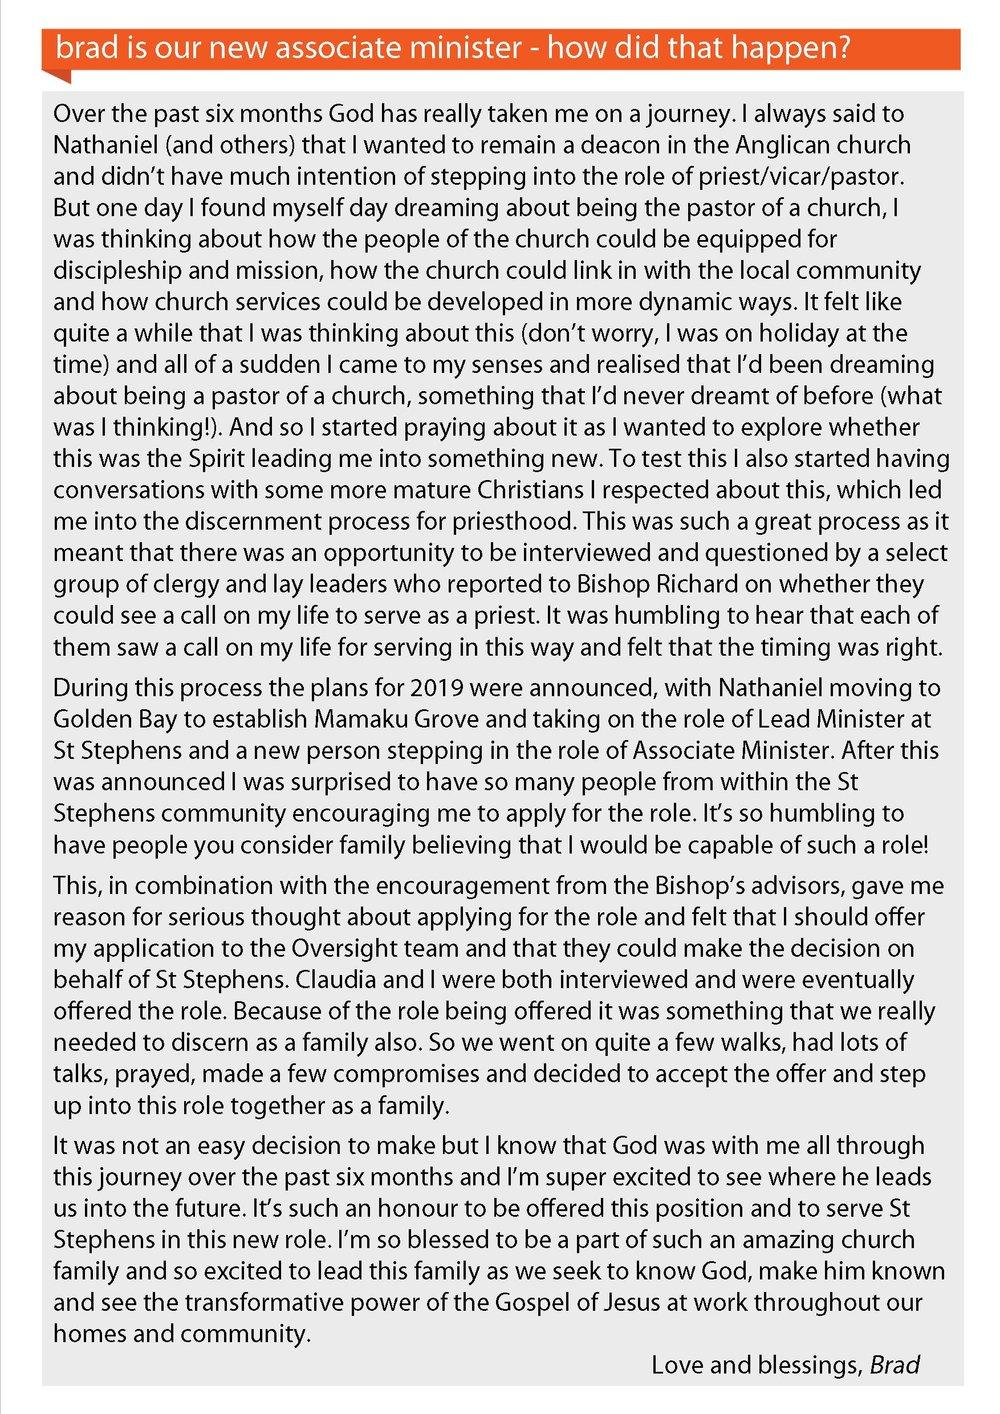 4th November page 3.jpg